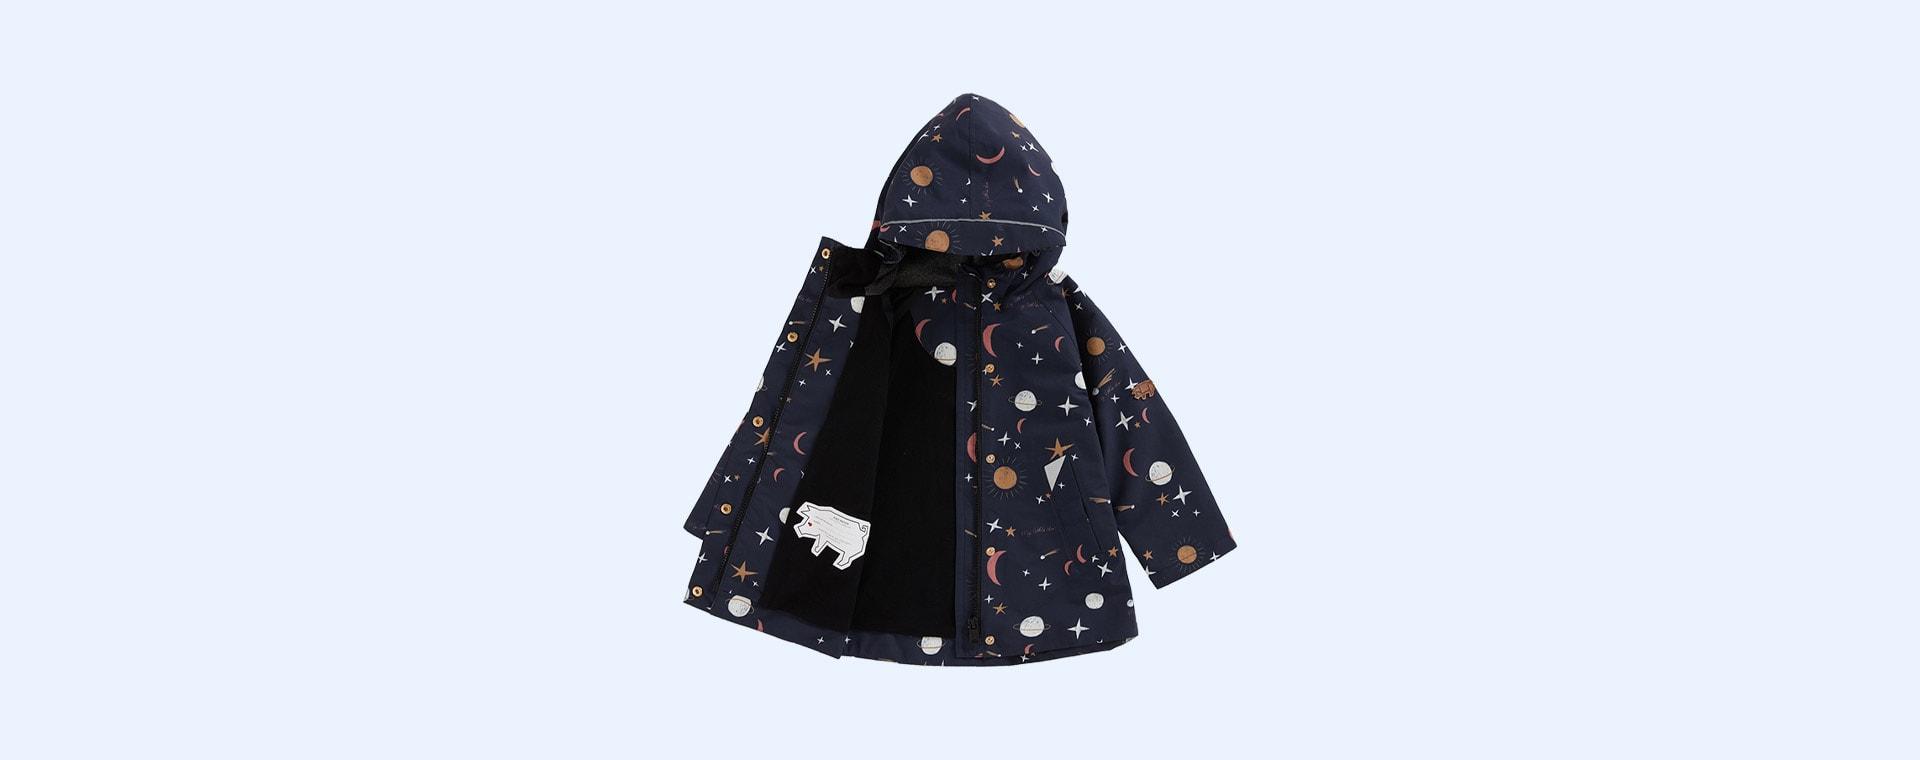 Evening Star Print Töastie Recycled Waterproof Raincoat